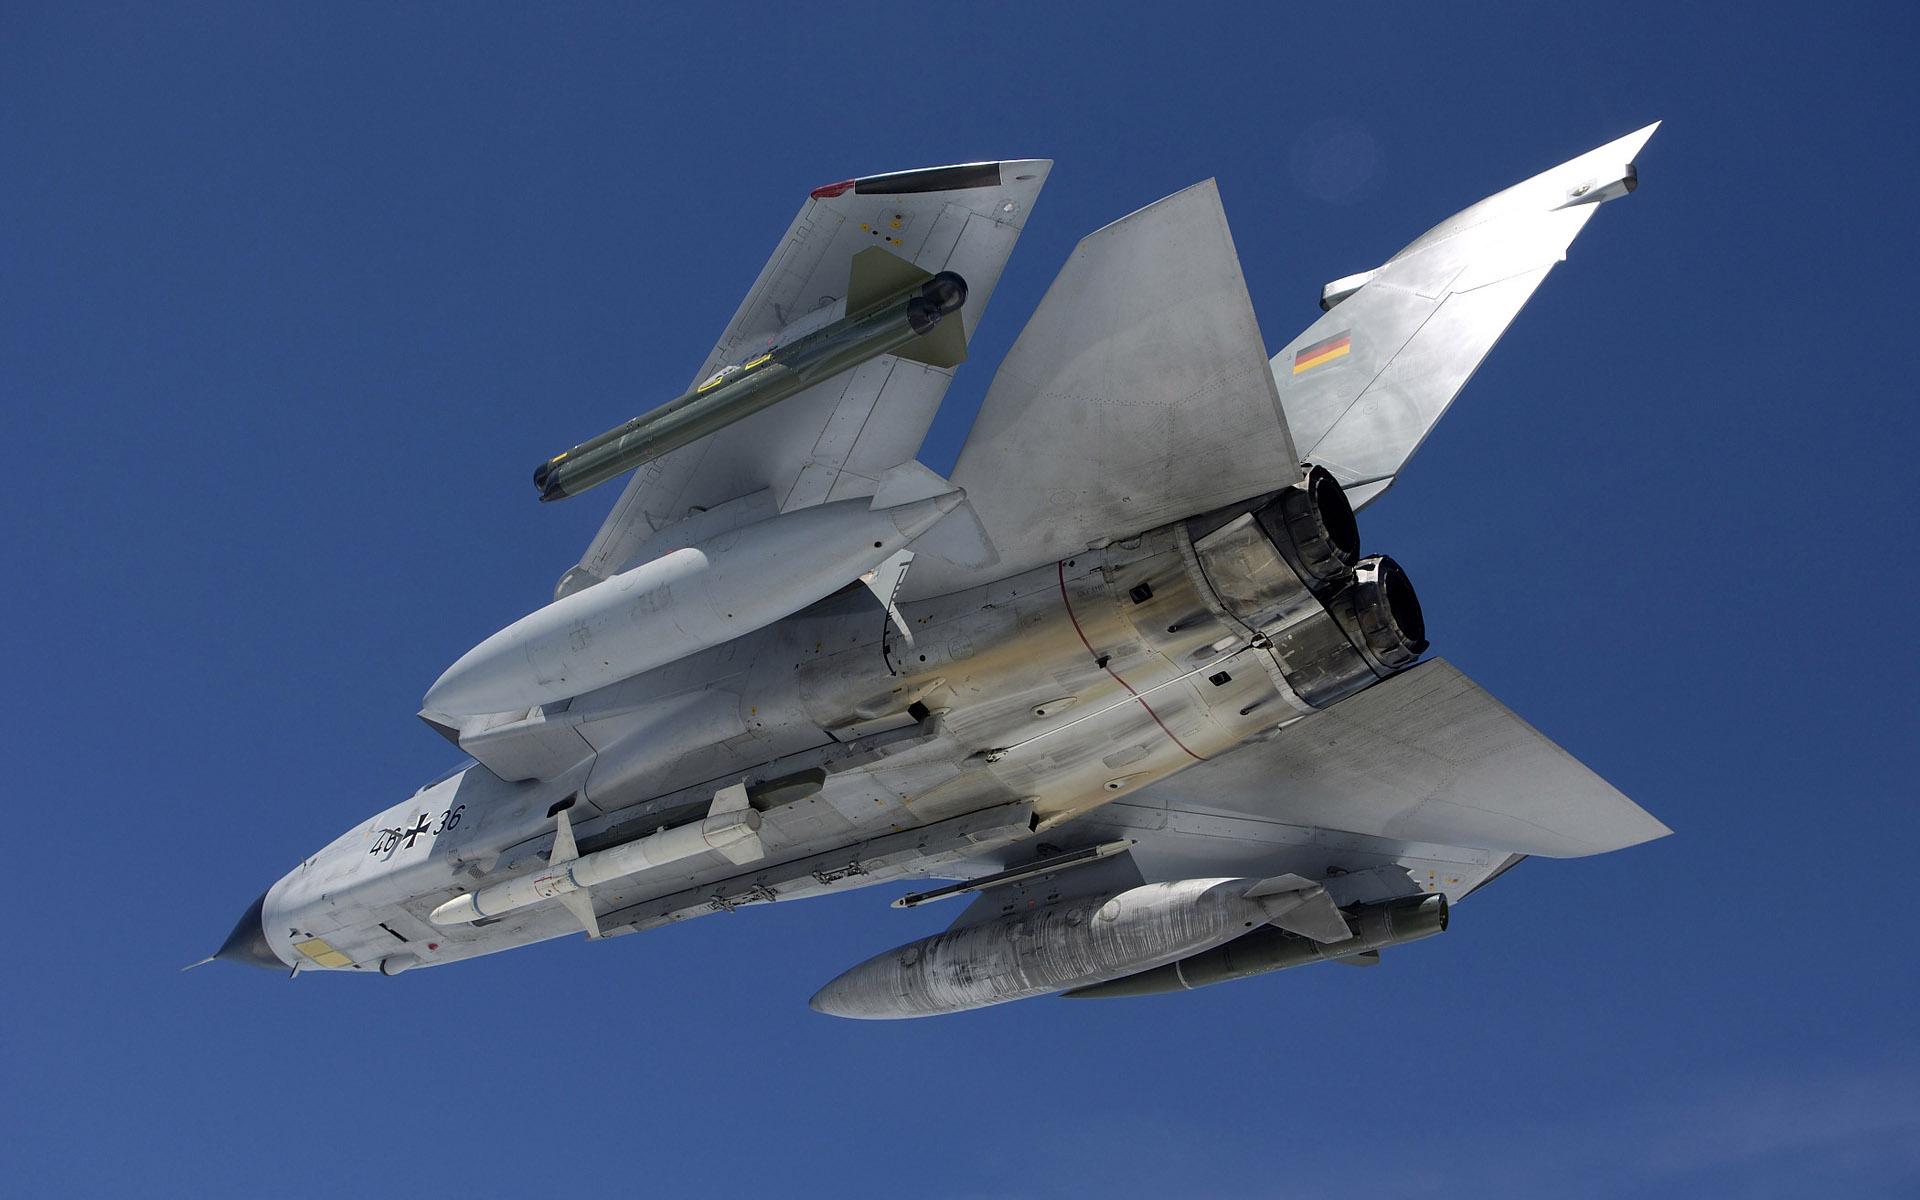 Plane Iphone Wallpaper Tornado Ids Wallpapers Hd Wallpapers Id 5911